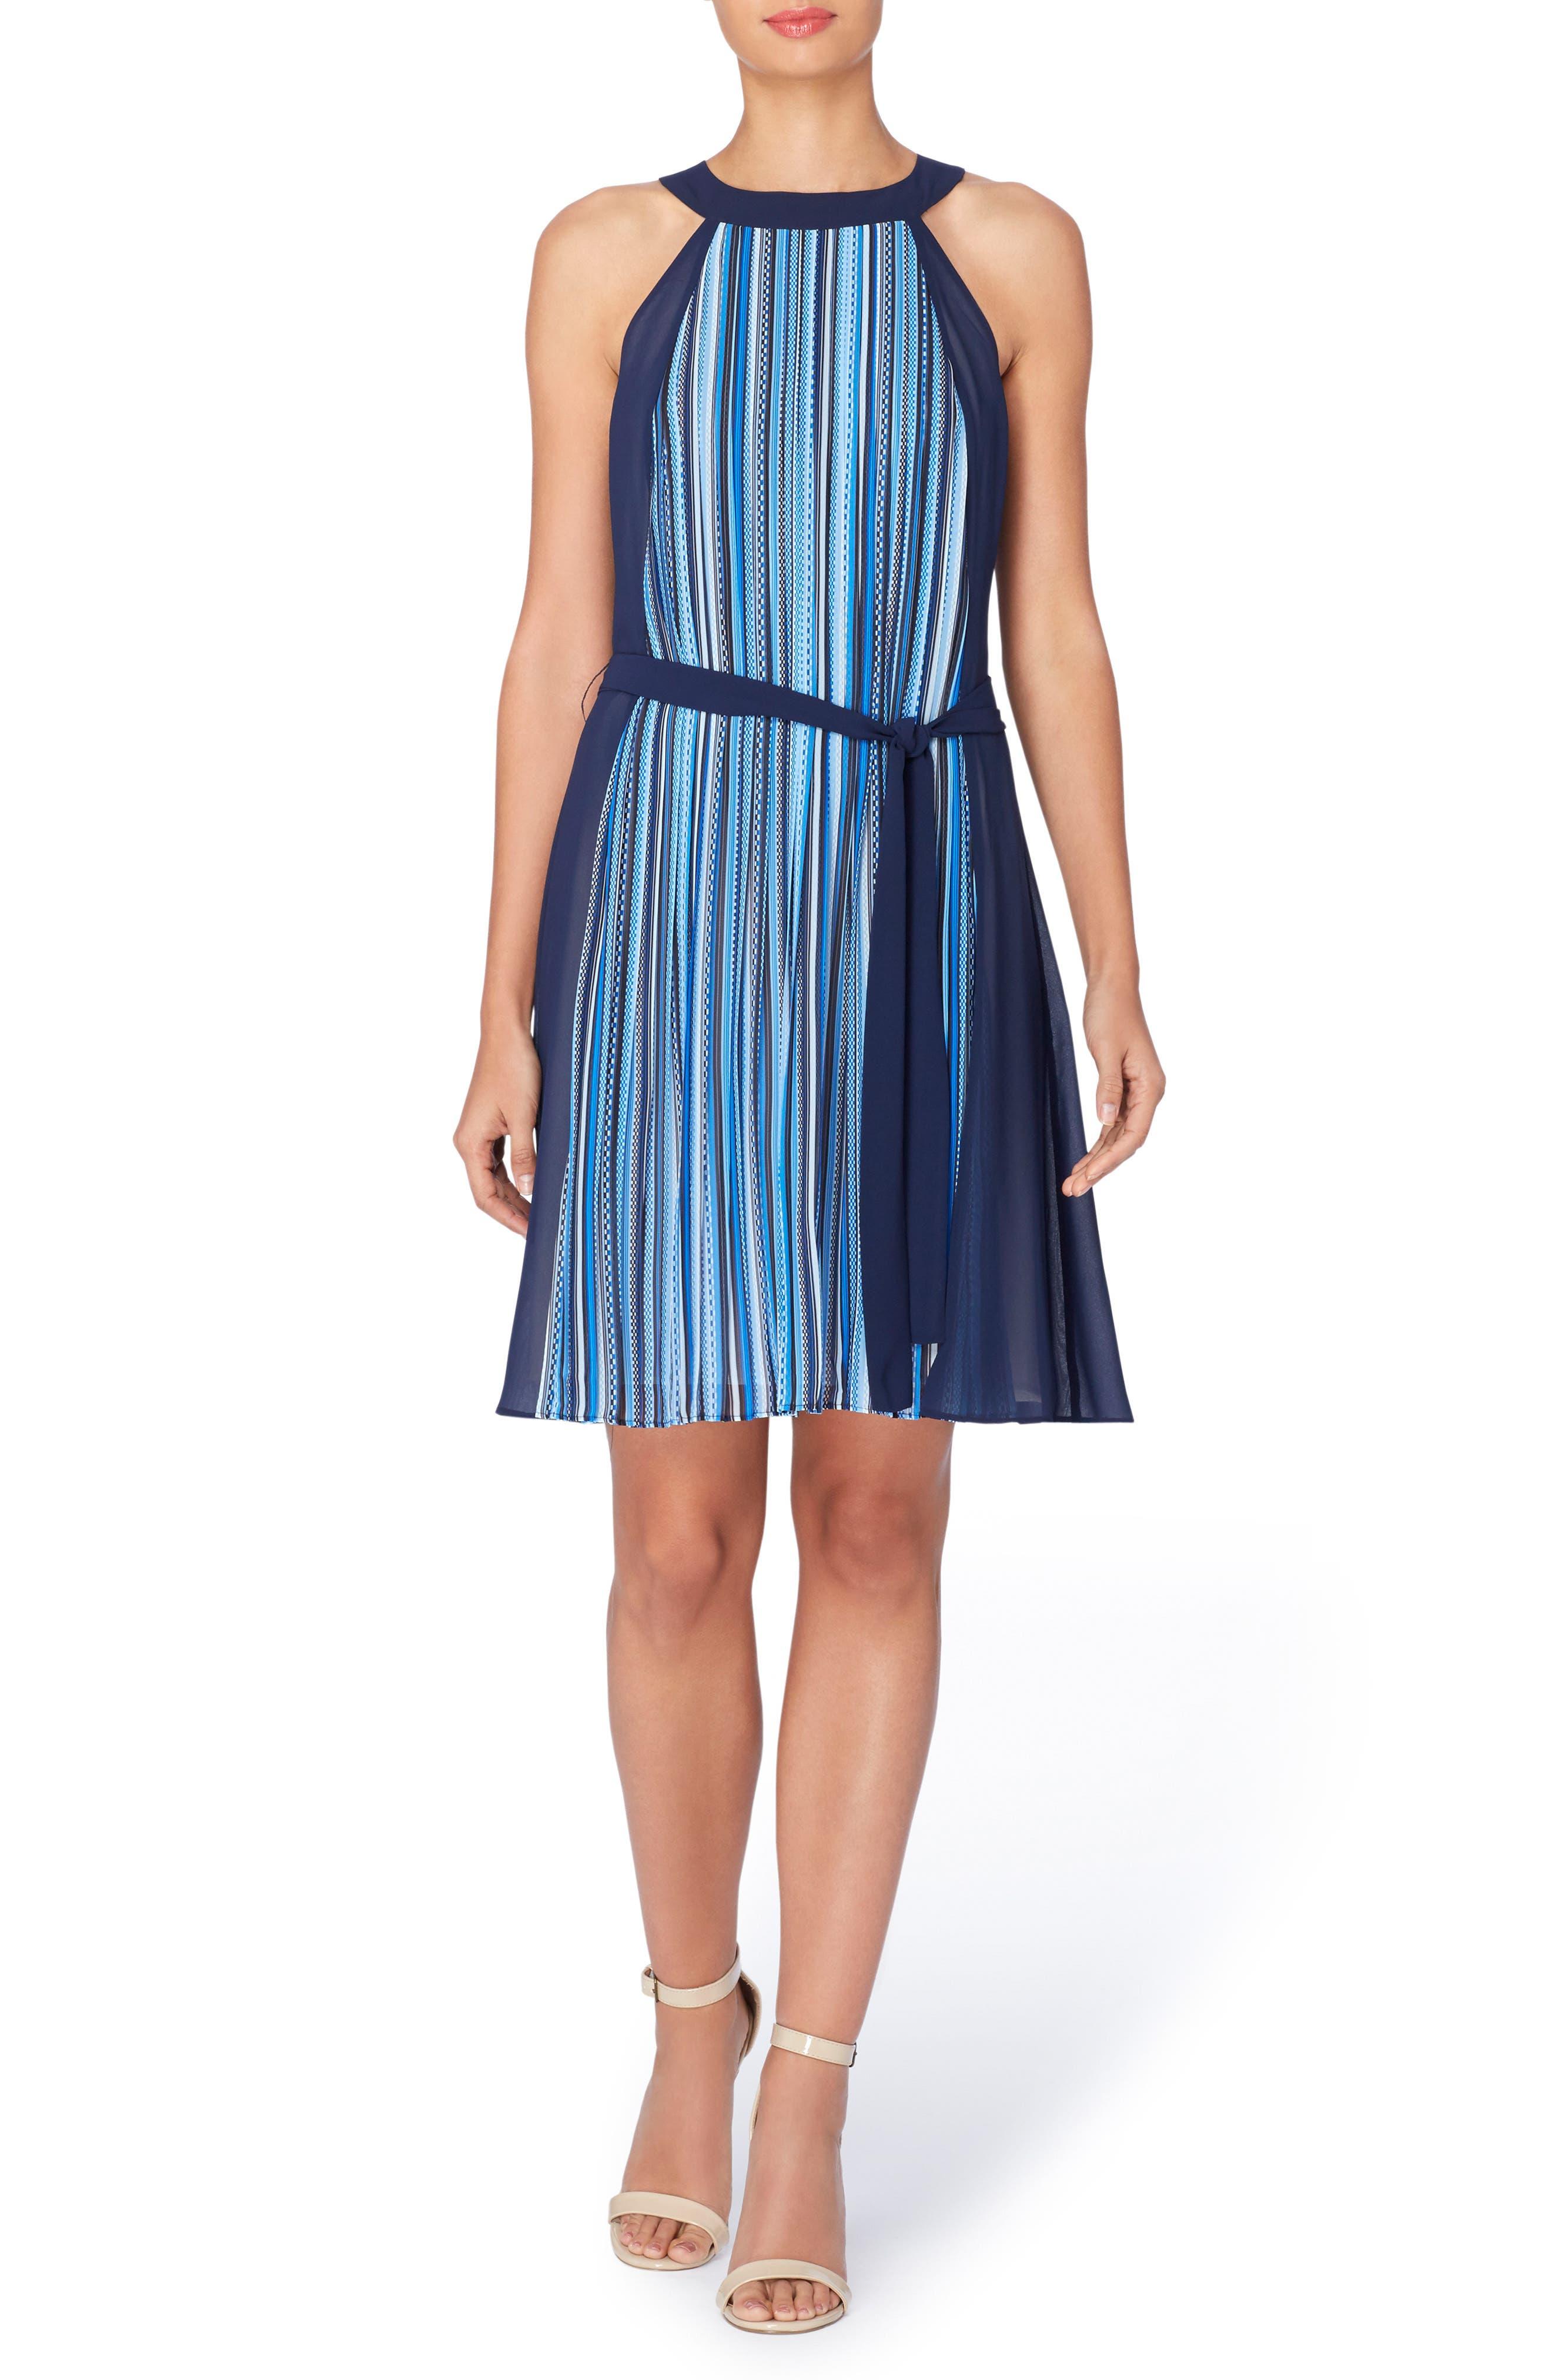 Catherine Catherine Malandrino Chazz Stripe A-Line Dress